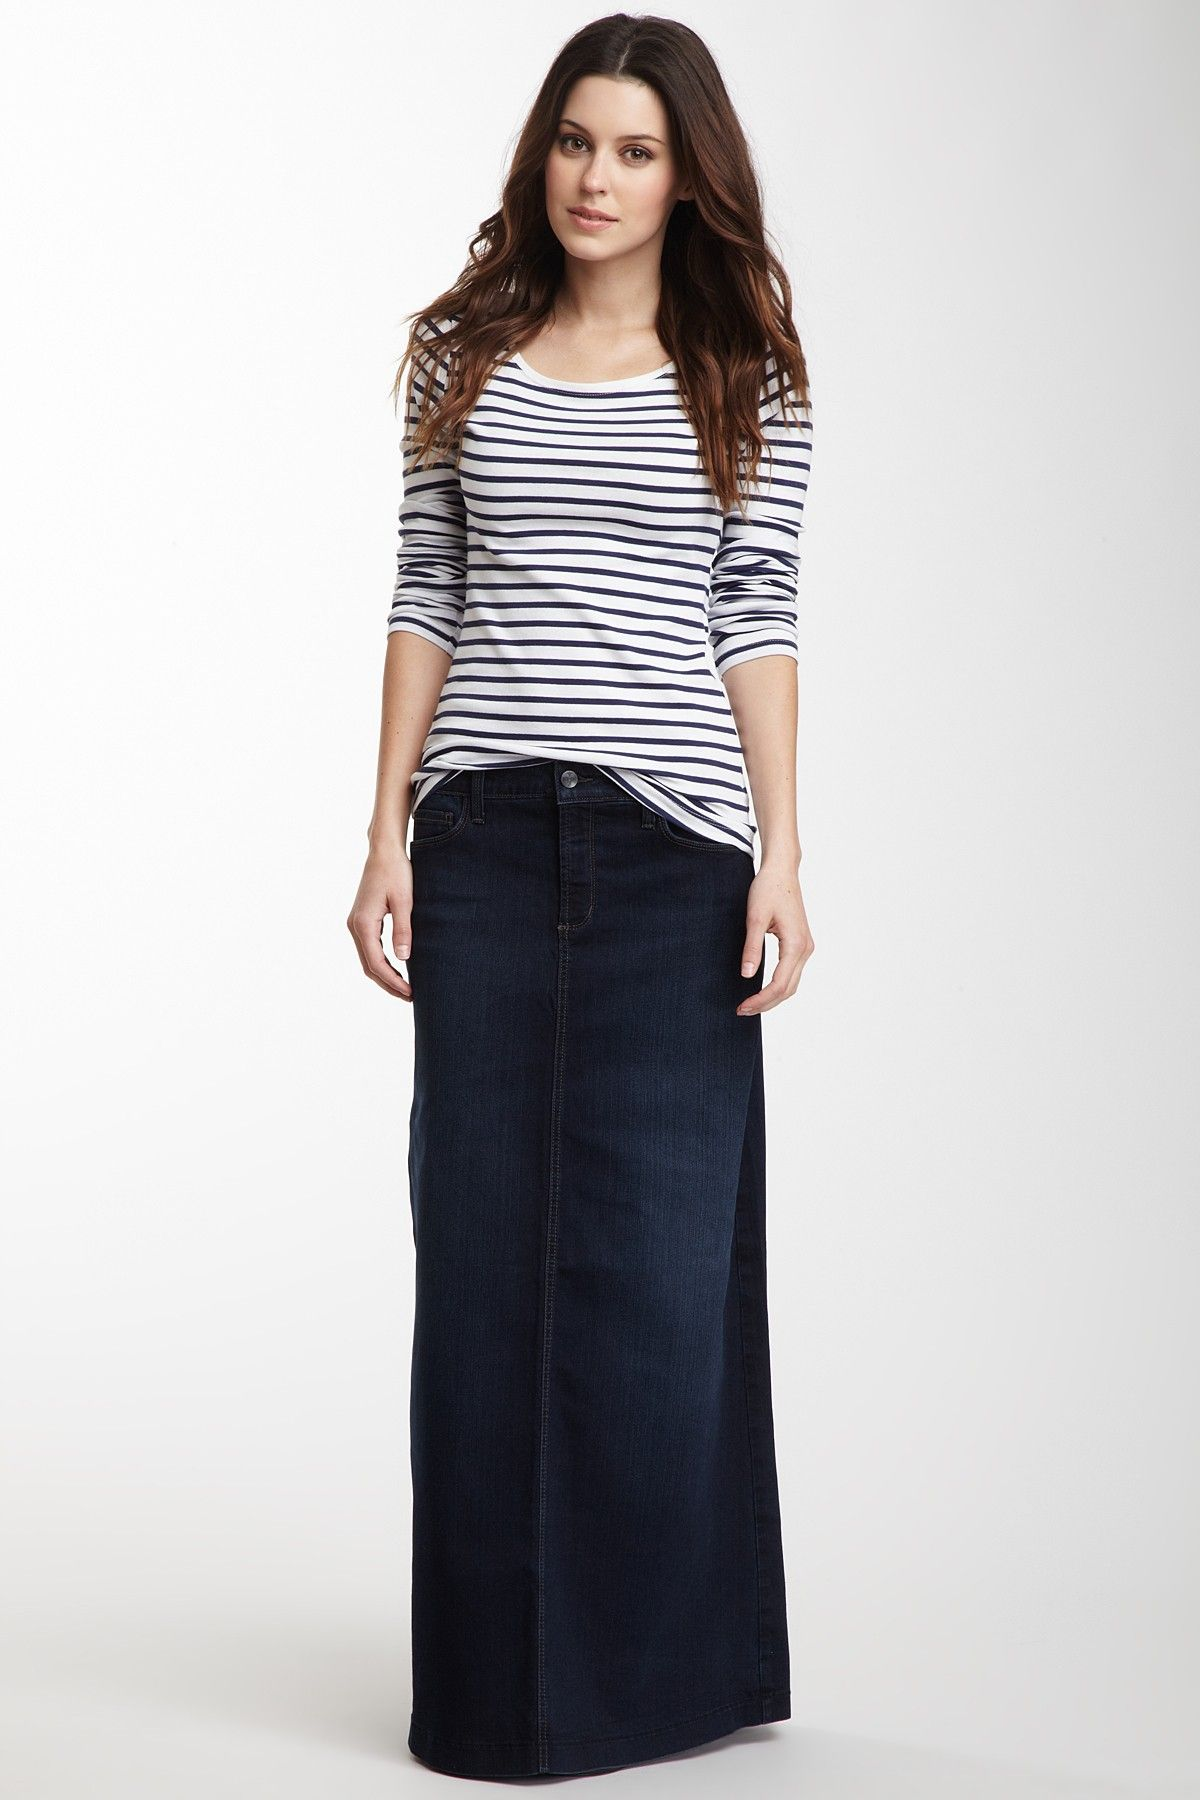 Jeans skirt maxi dress